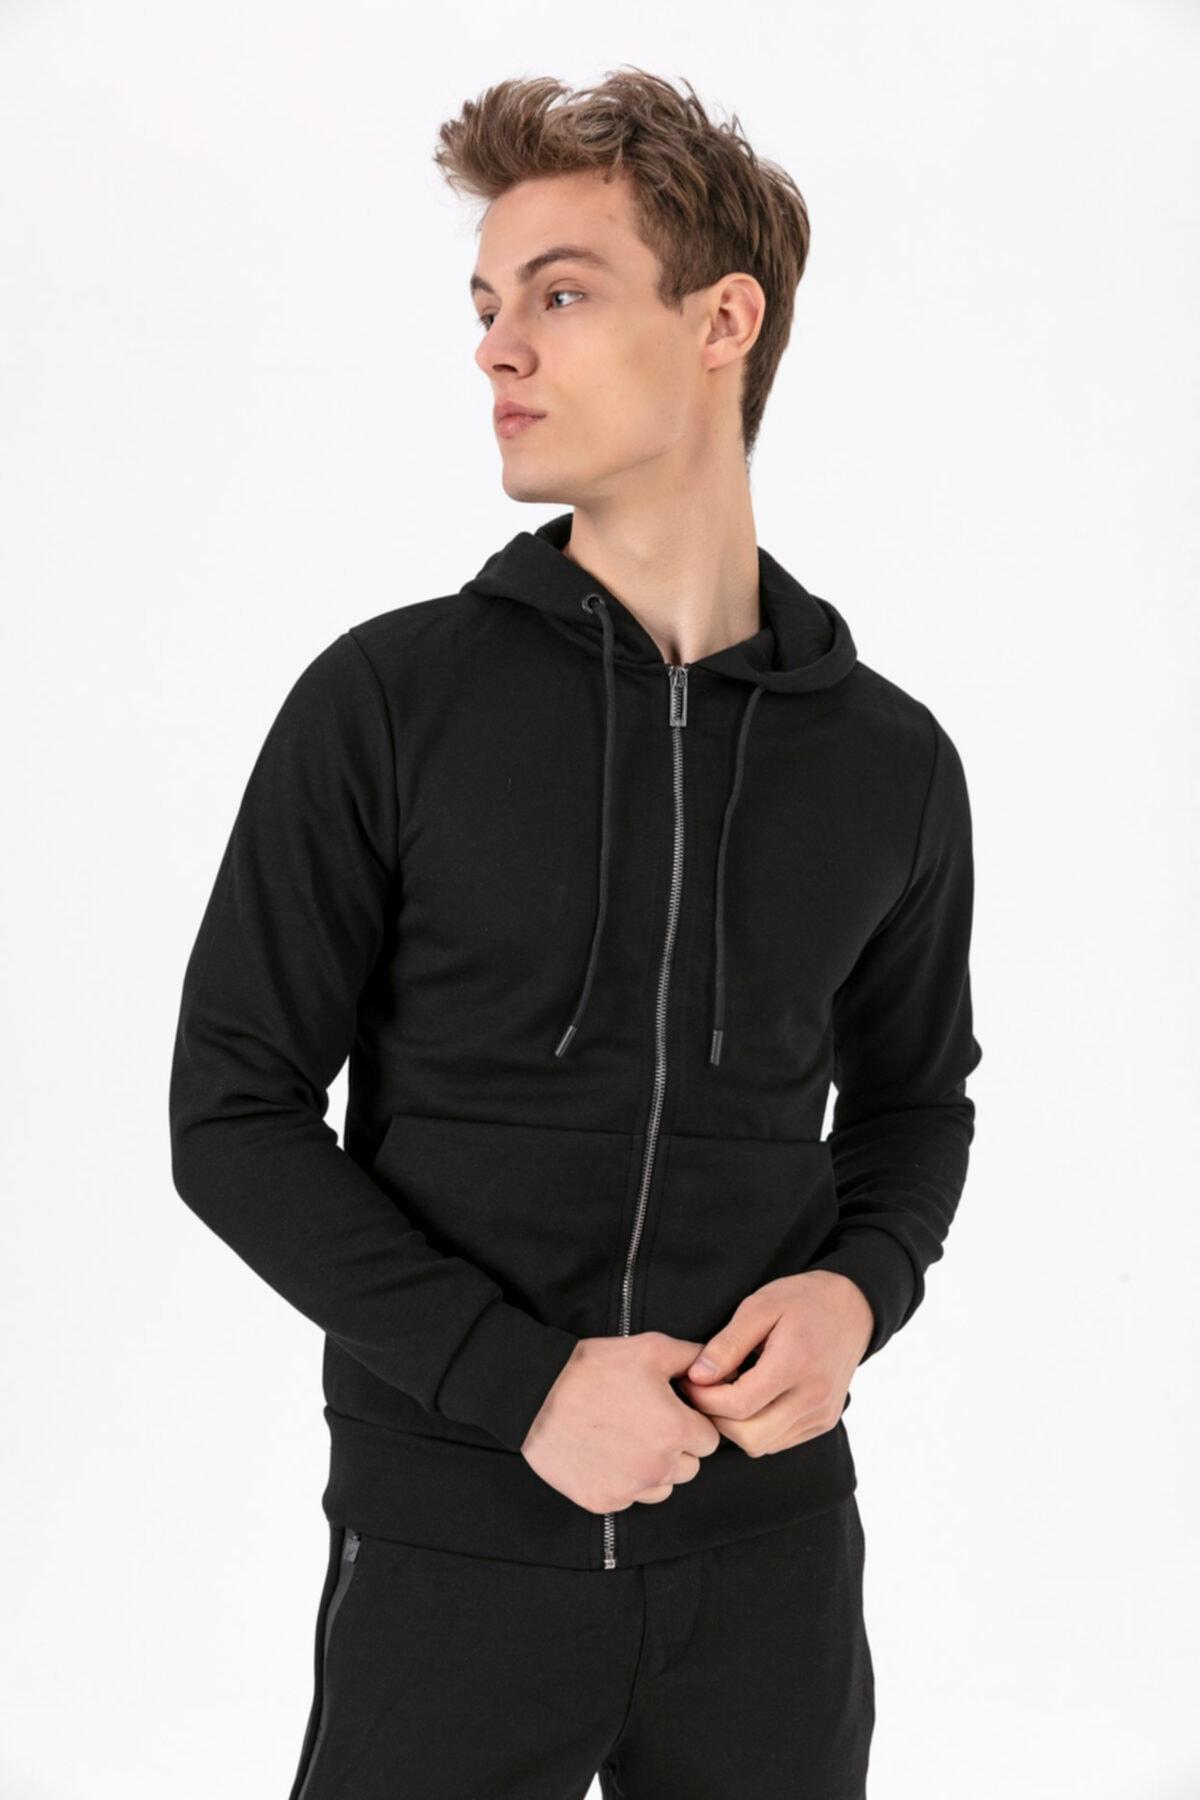 Fabregas 9532 Siyah Fermuarlı Kapşonlu Sweatshirt 1